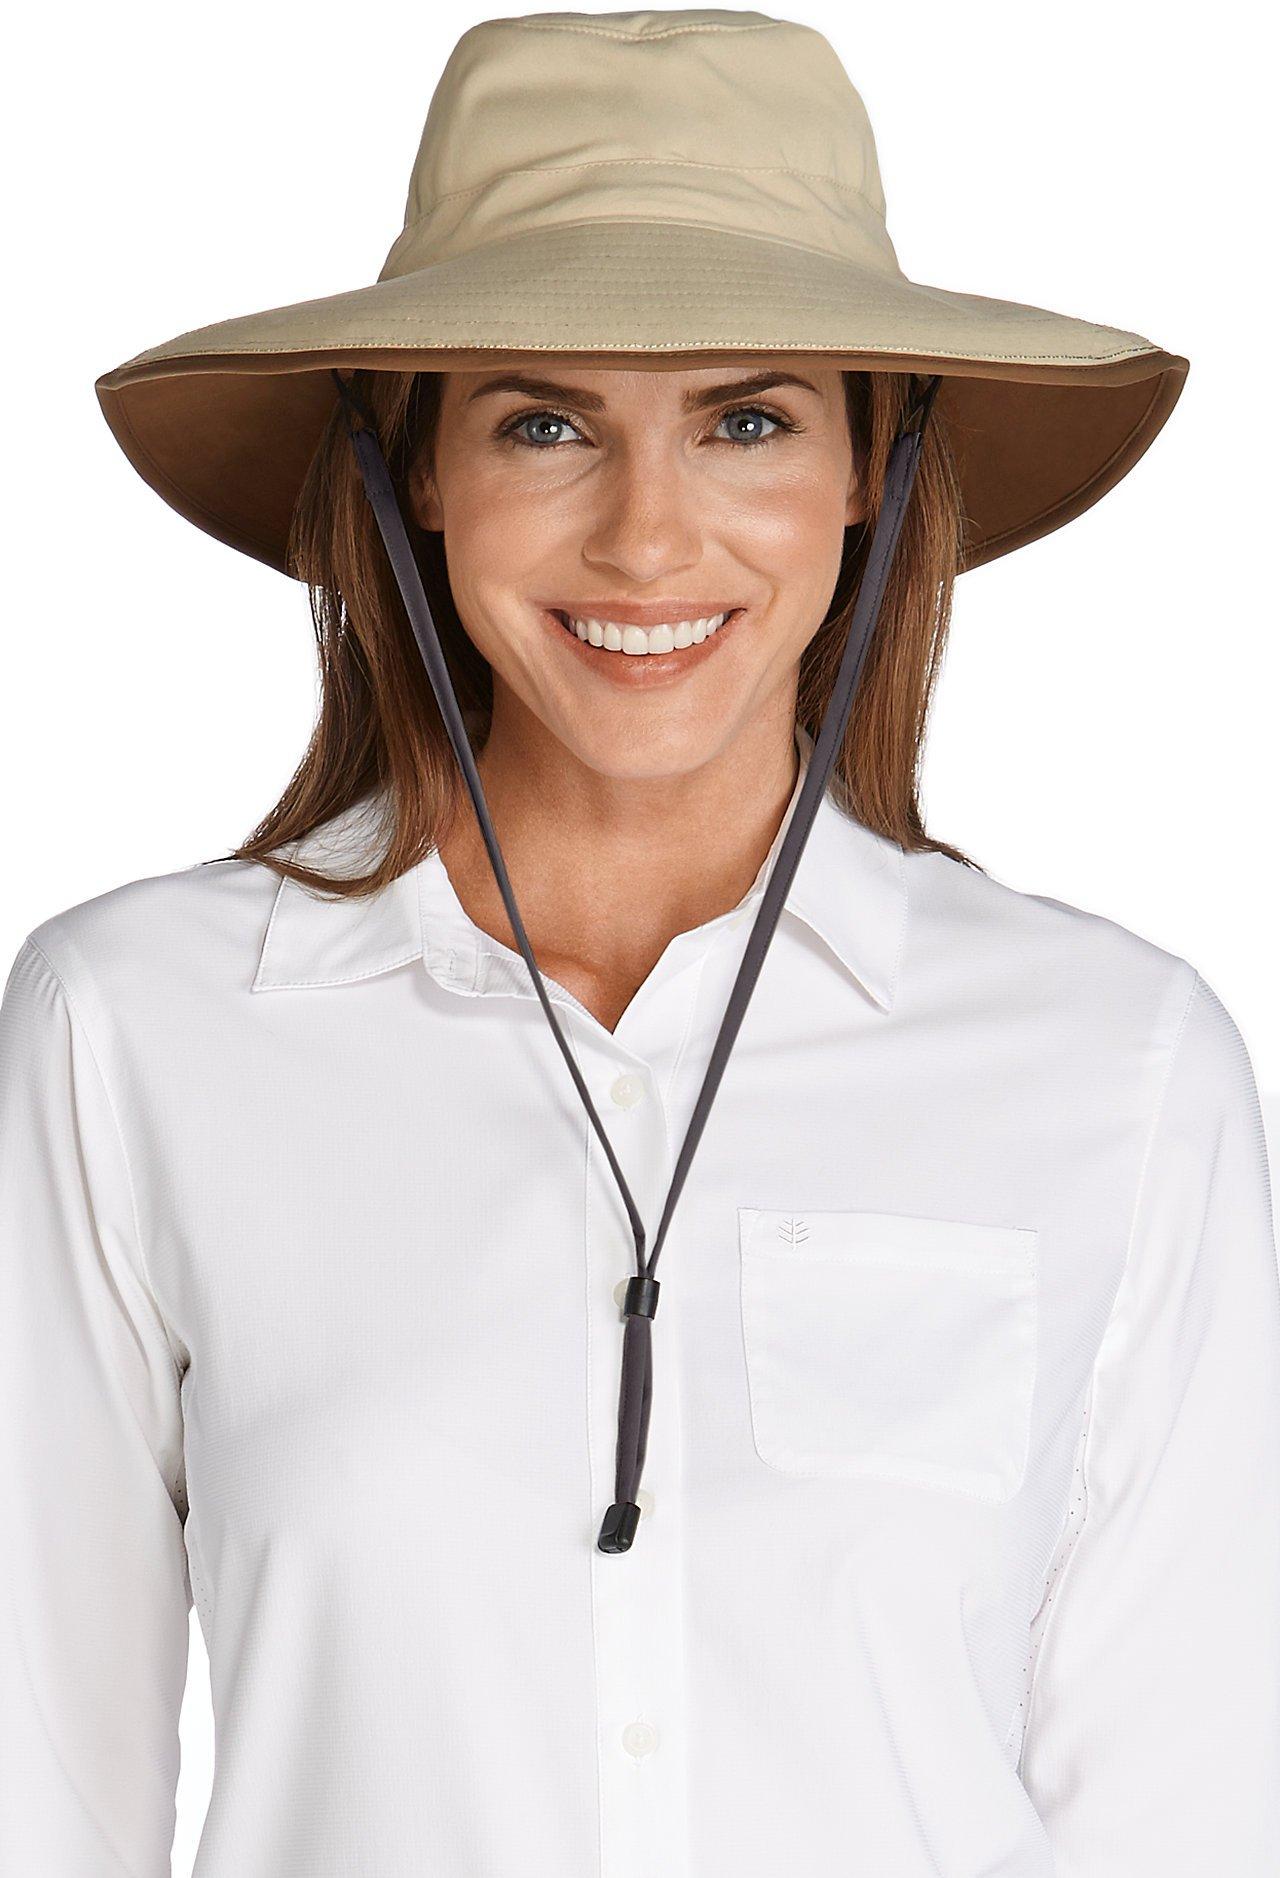 Coolibar UPF 50+ Women's Sun Catcher Shapeable Hat - Sun Protective (One Size- Tan/Khaki)